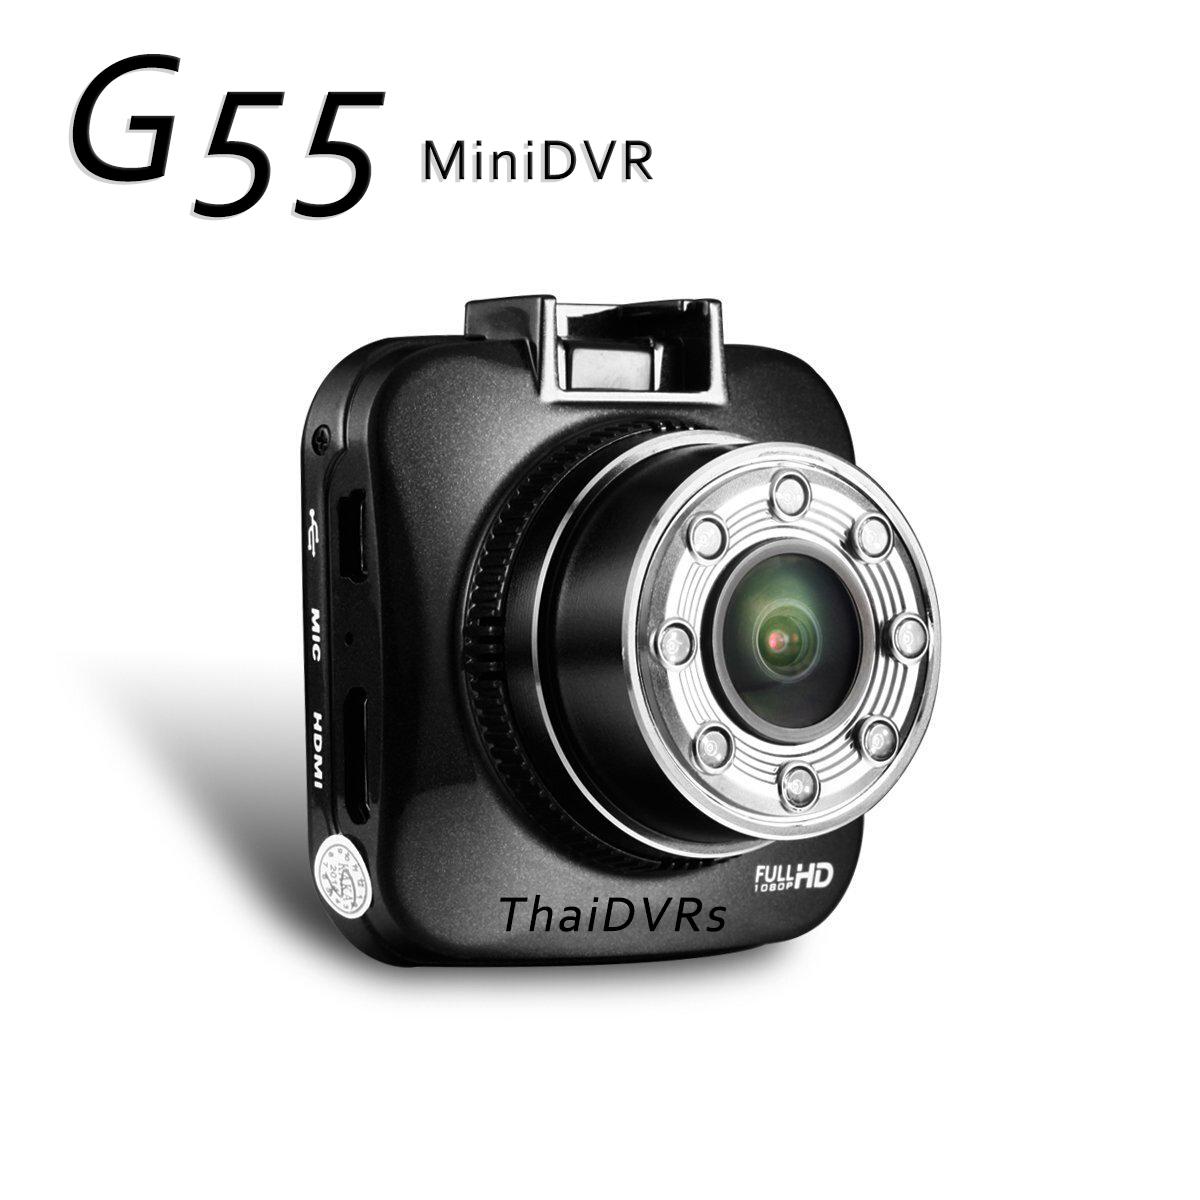 G55 miniDVR